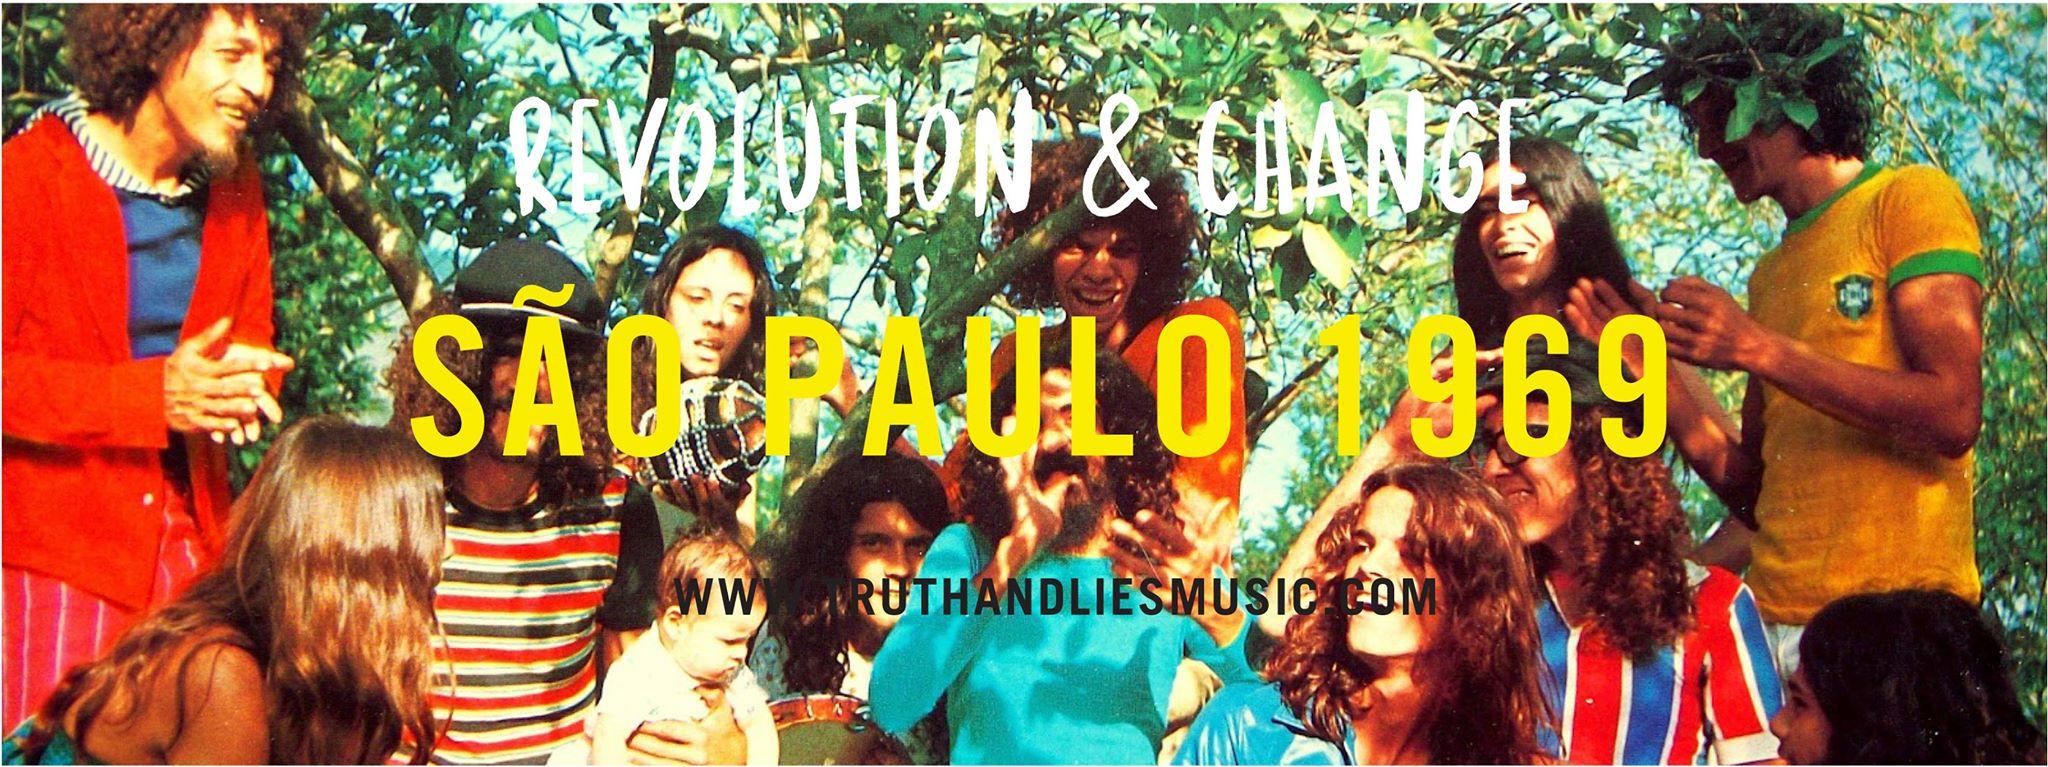 truth-lies-sao-paulo-1969-nottingham